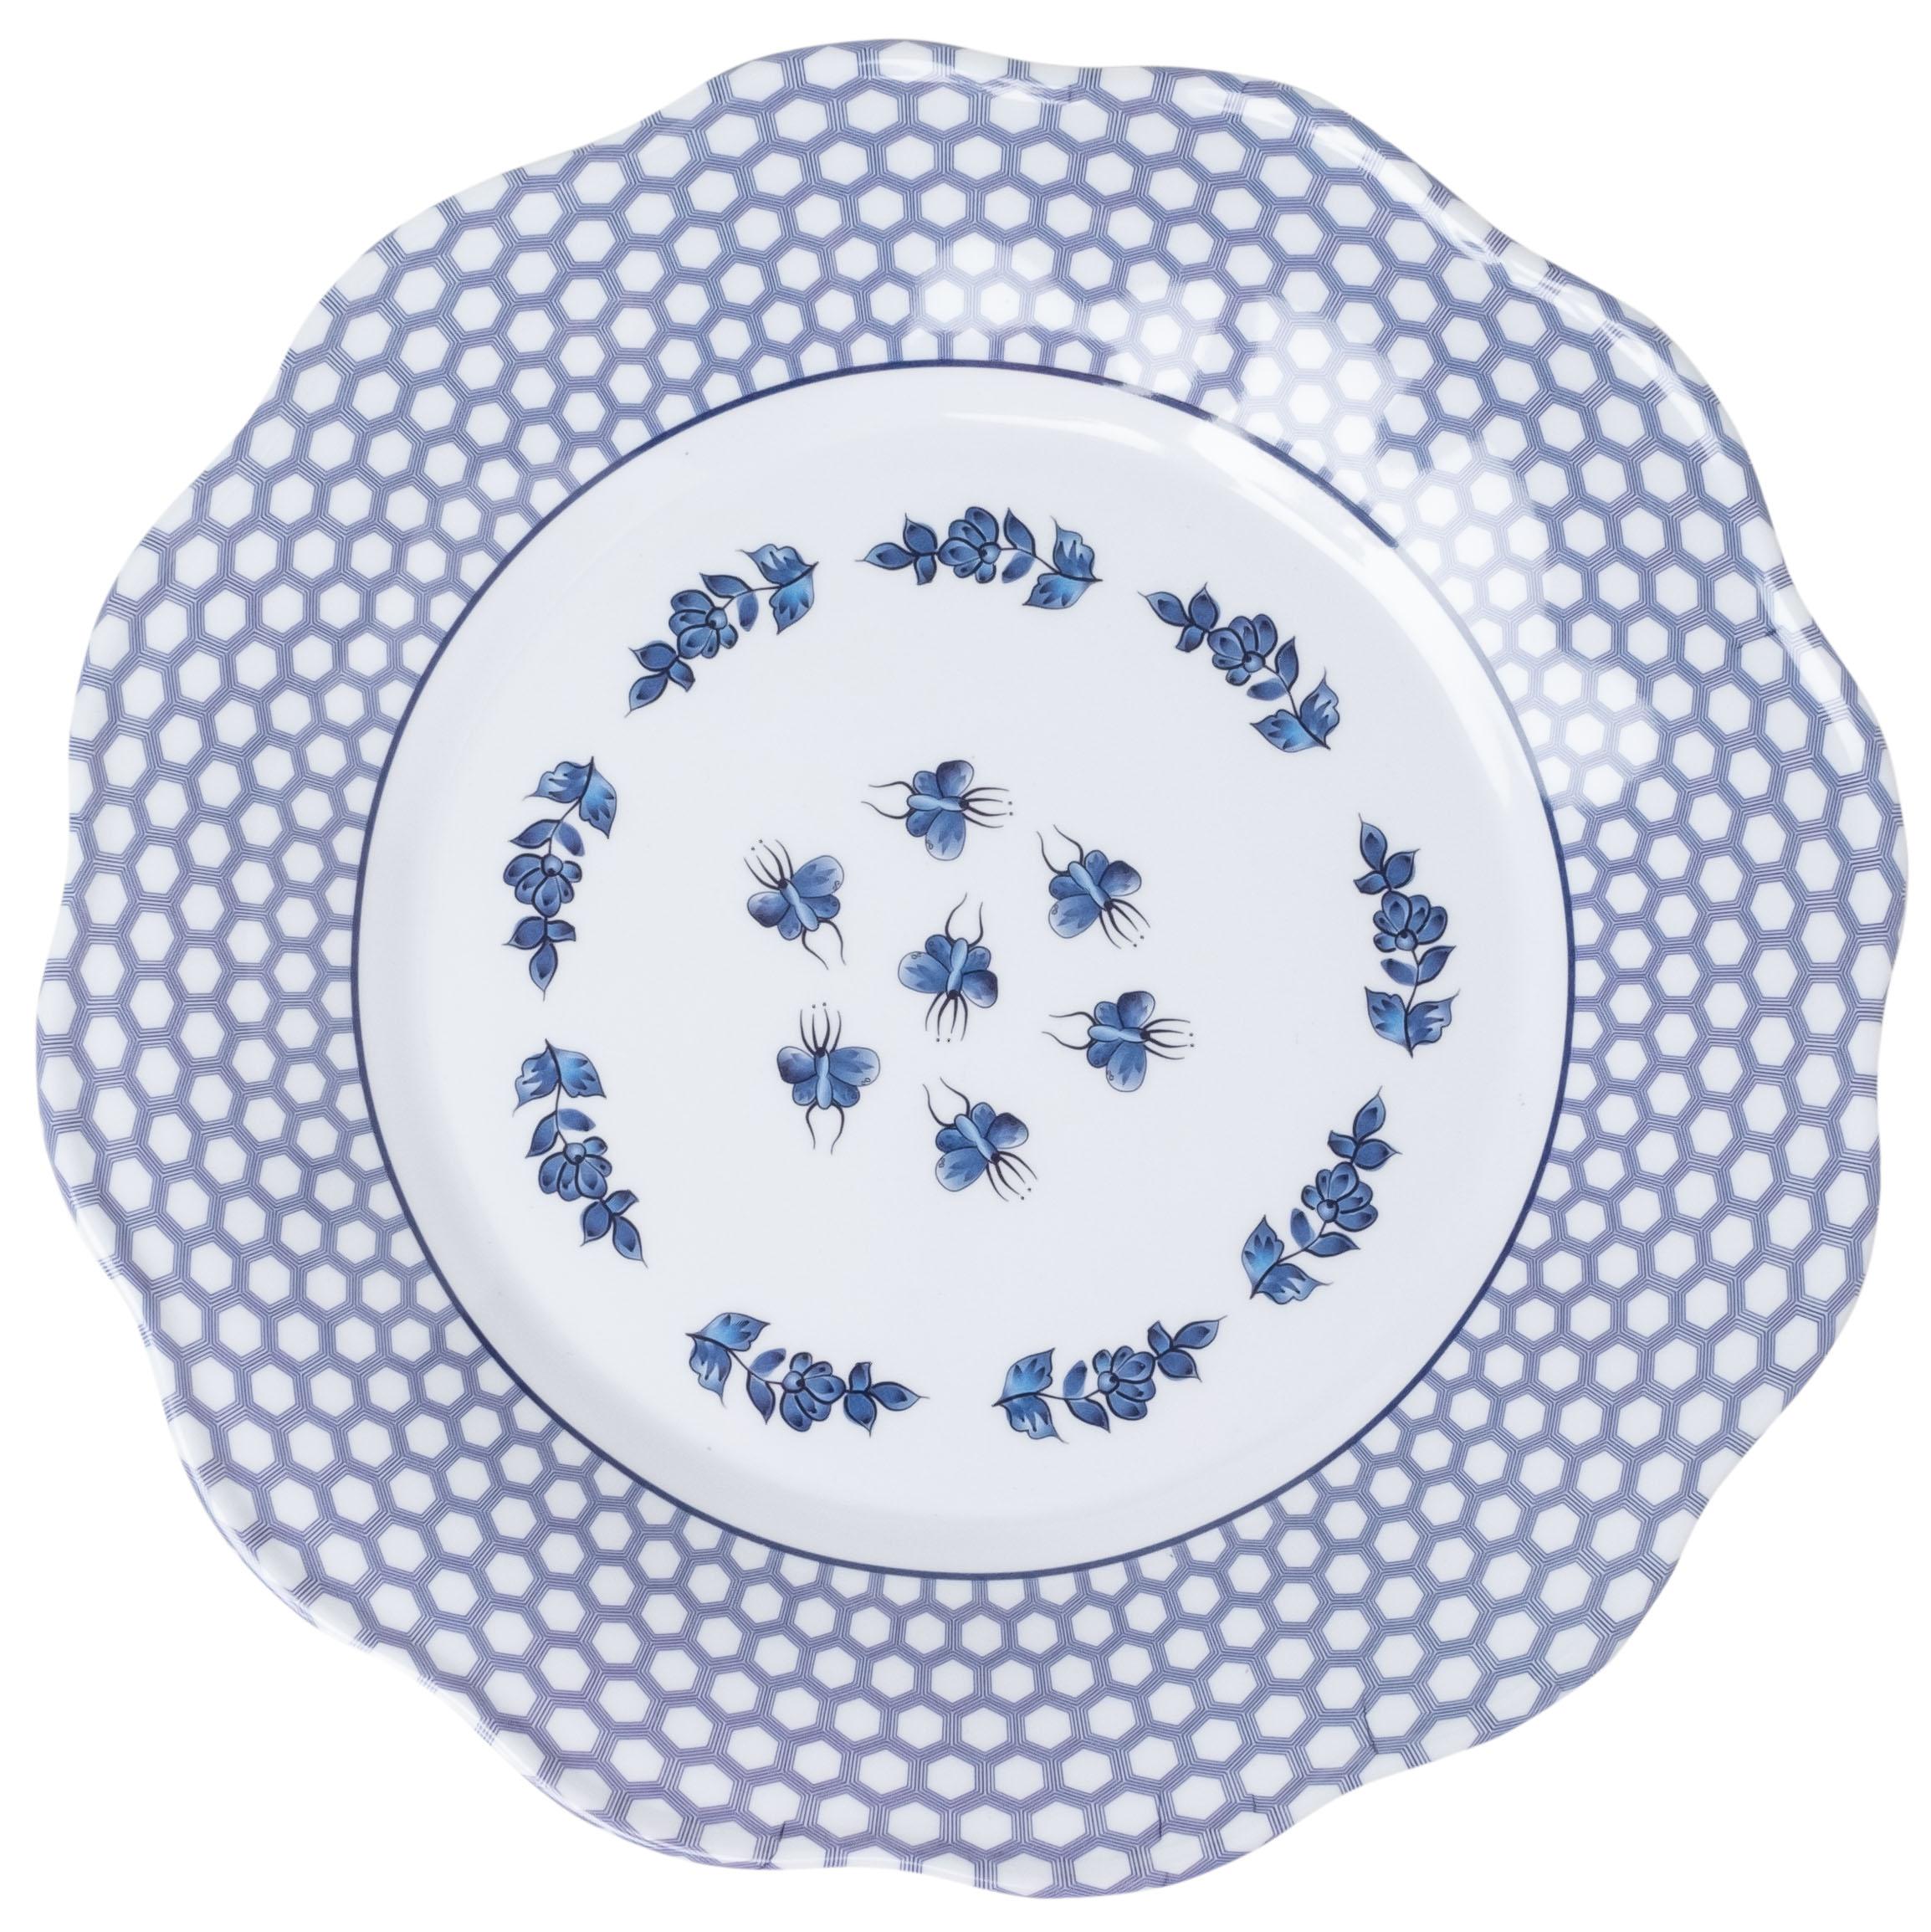 Set of 12 floral/trellis melamine dinner plates